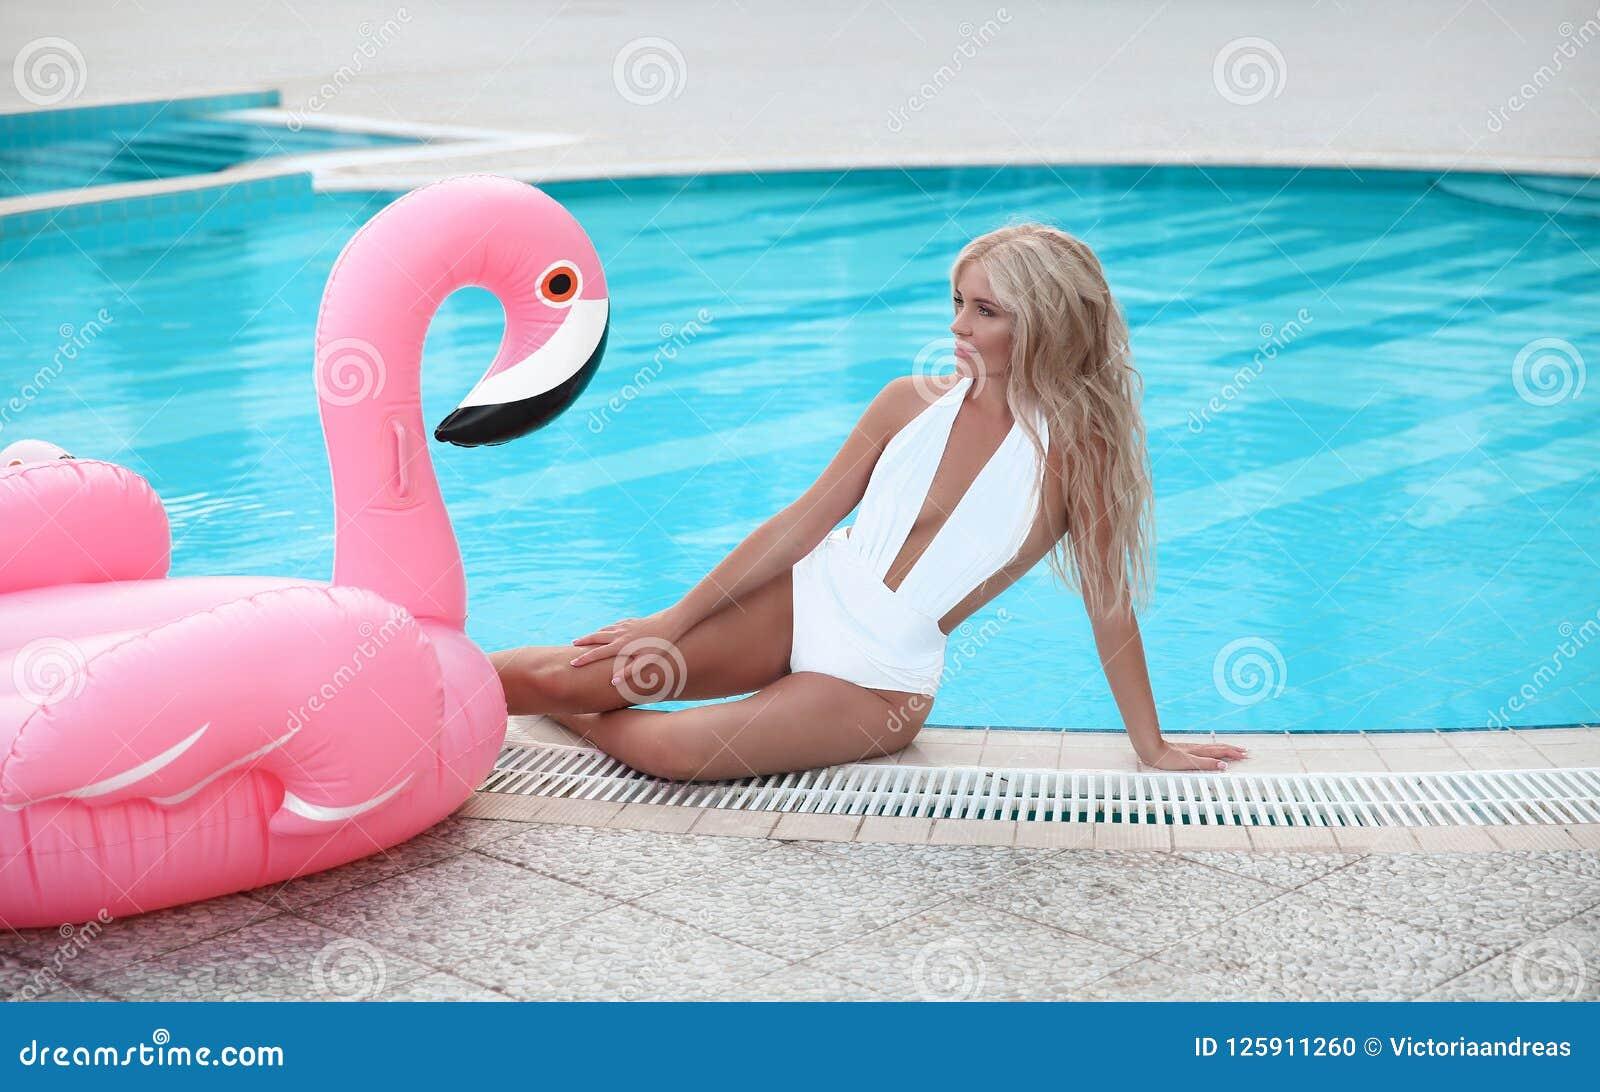 Fashion blond model woman in white bikini posing on Pink in